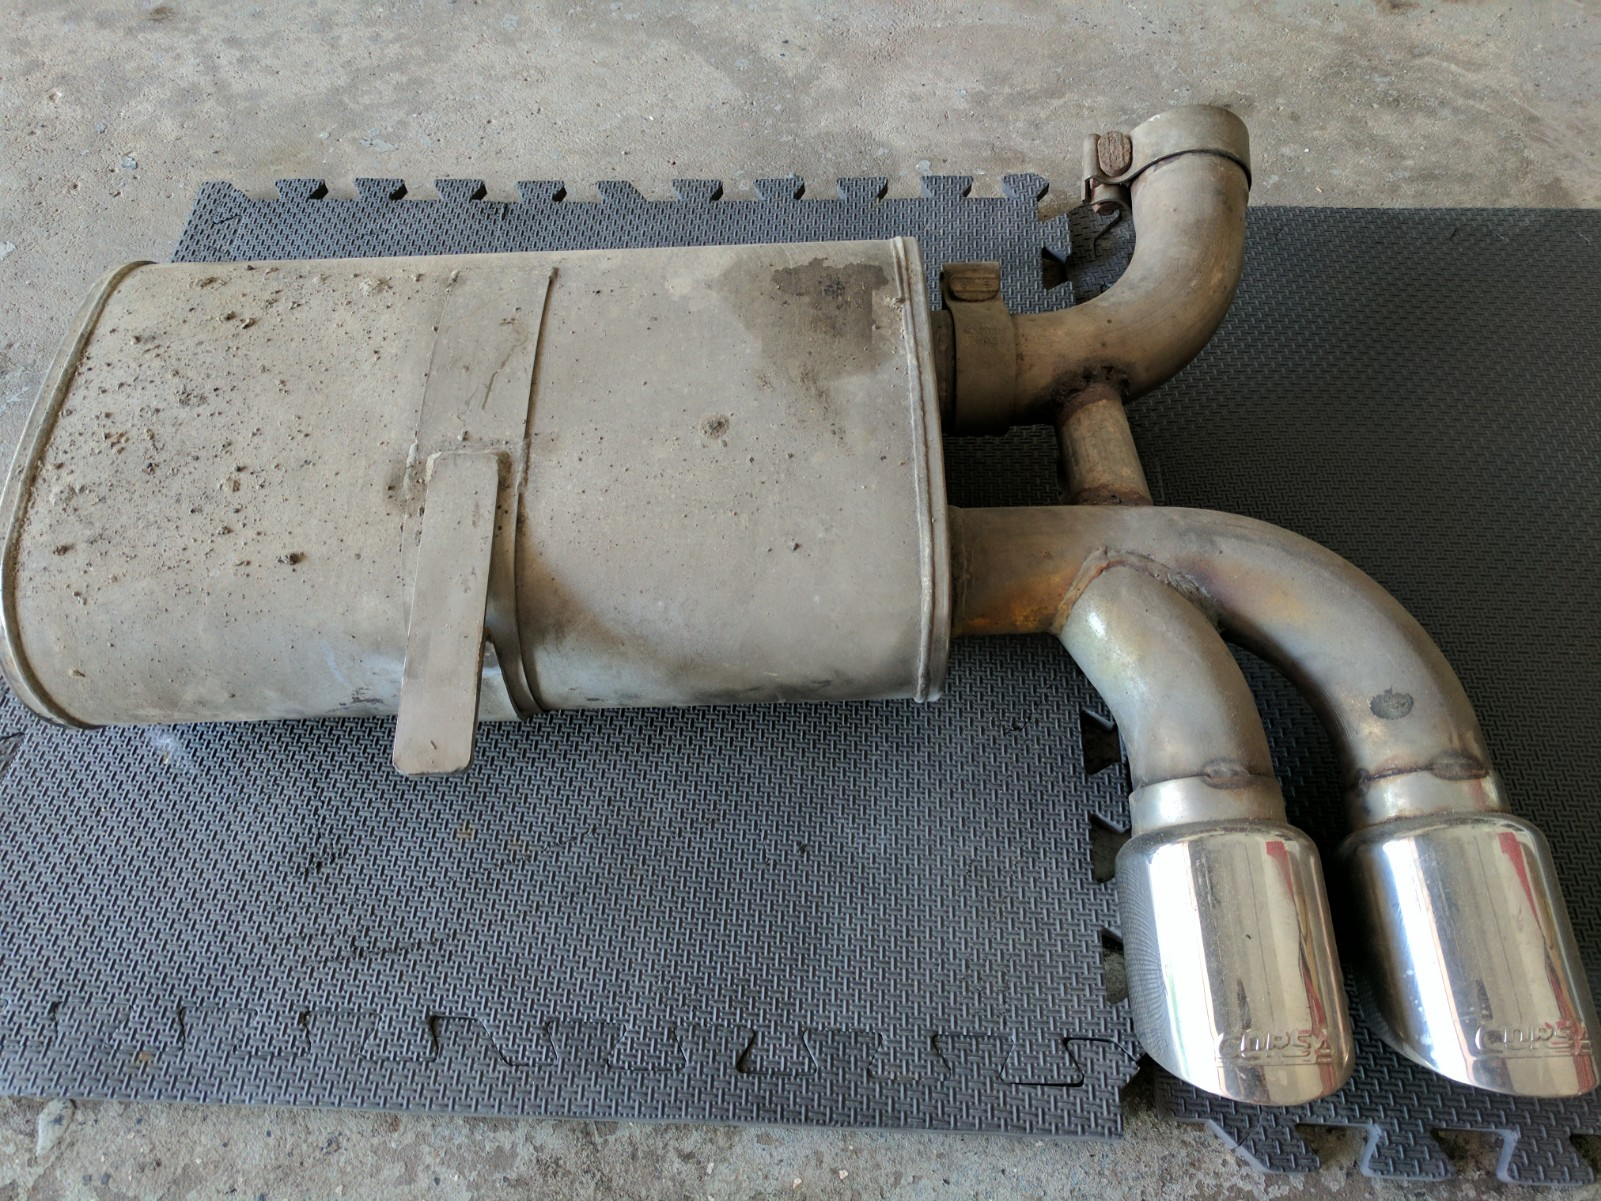 c5 corsa sport exhaust system